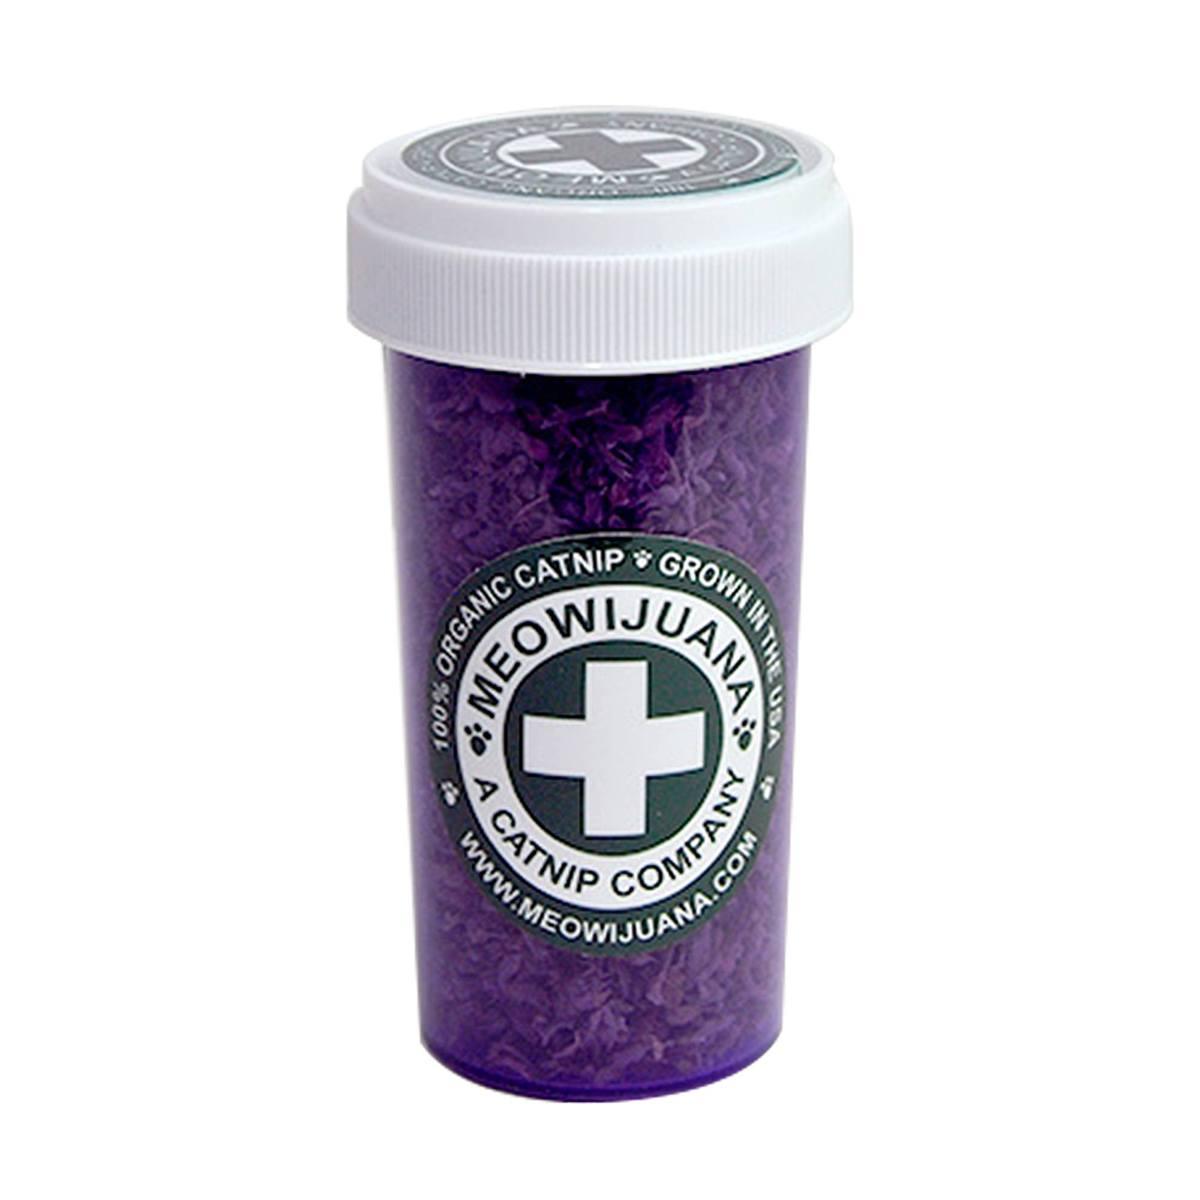 Meowijuana Purrple Passion - Silvervine and Catnip Blend